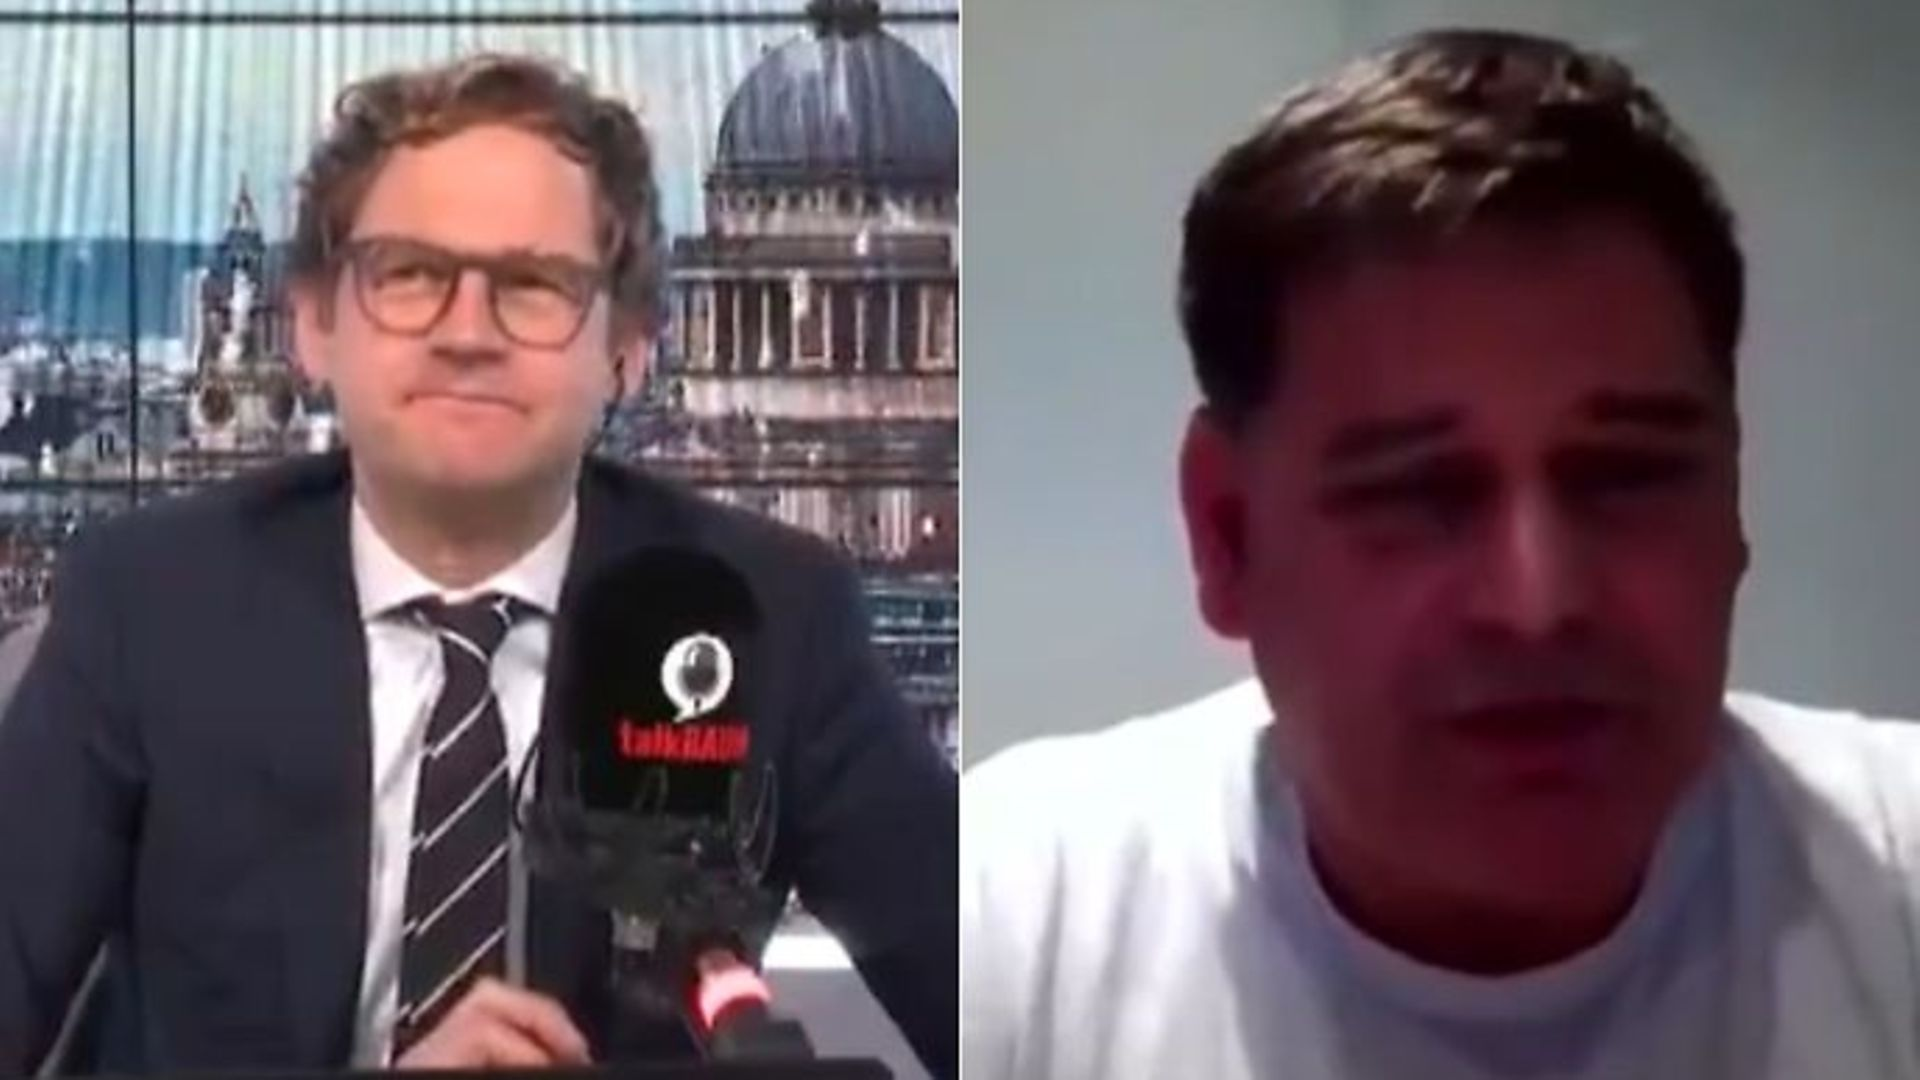 talkRADIO presenter Mark Dolan (L) and Brexiteer MP Andrew Bridgen - Credit: Twitter